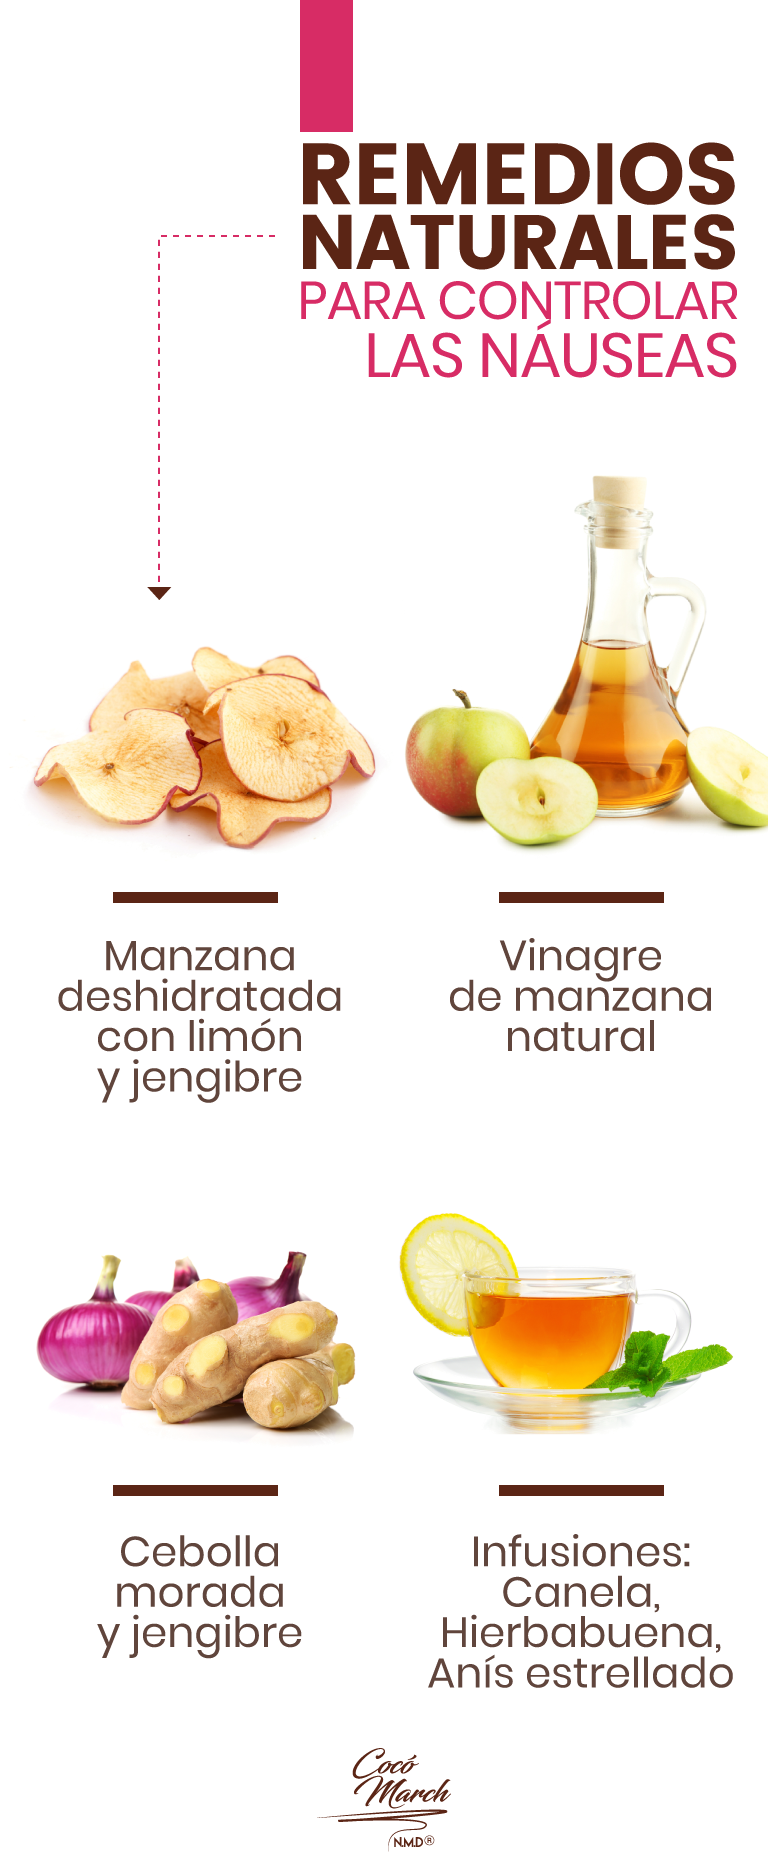 nauseas-remedios-naturales